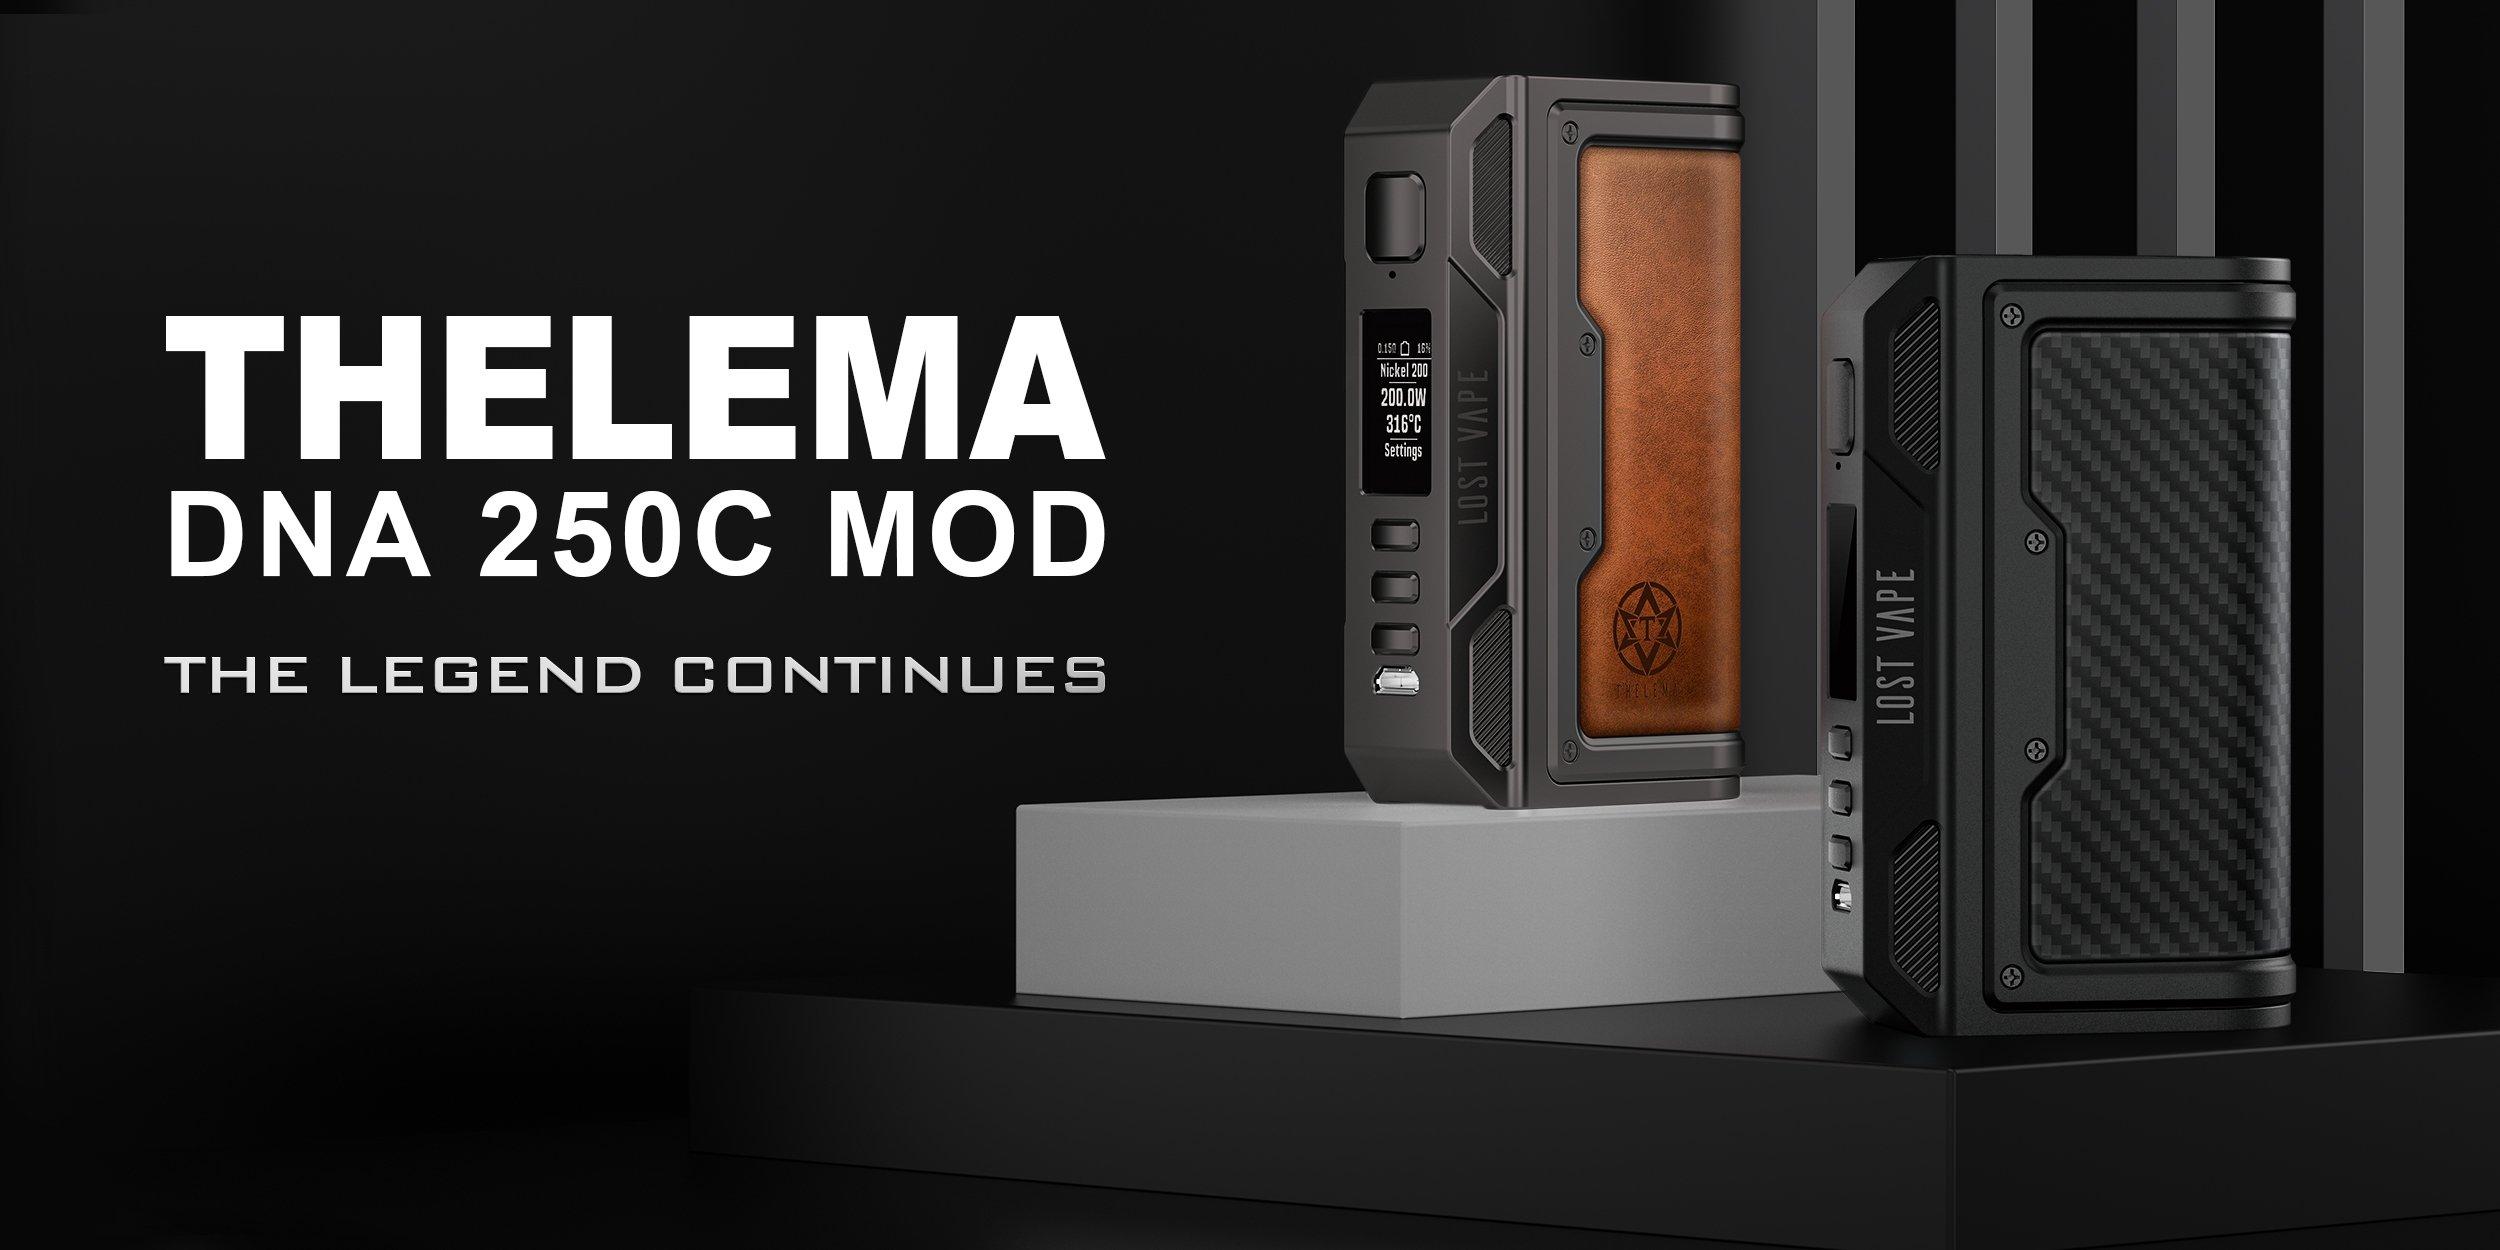 Lost Vape Thelema DNA250 Mod Promo UK